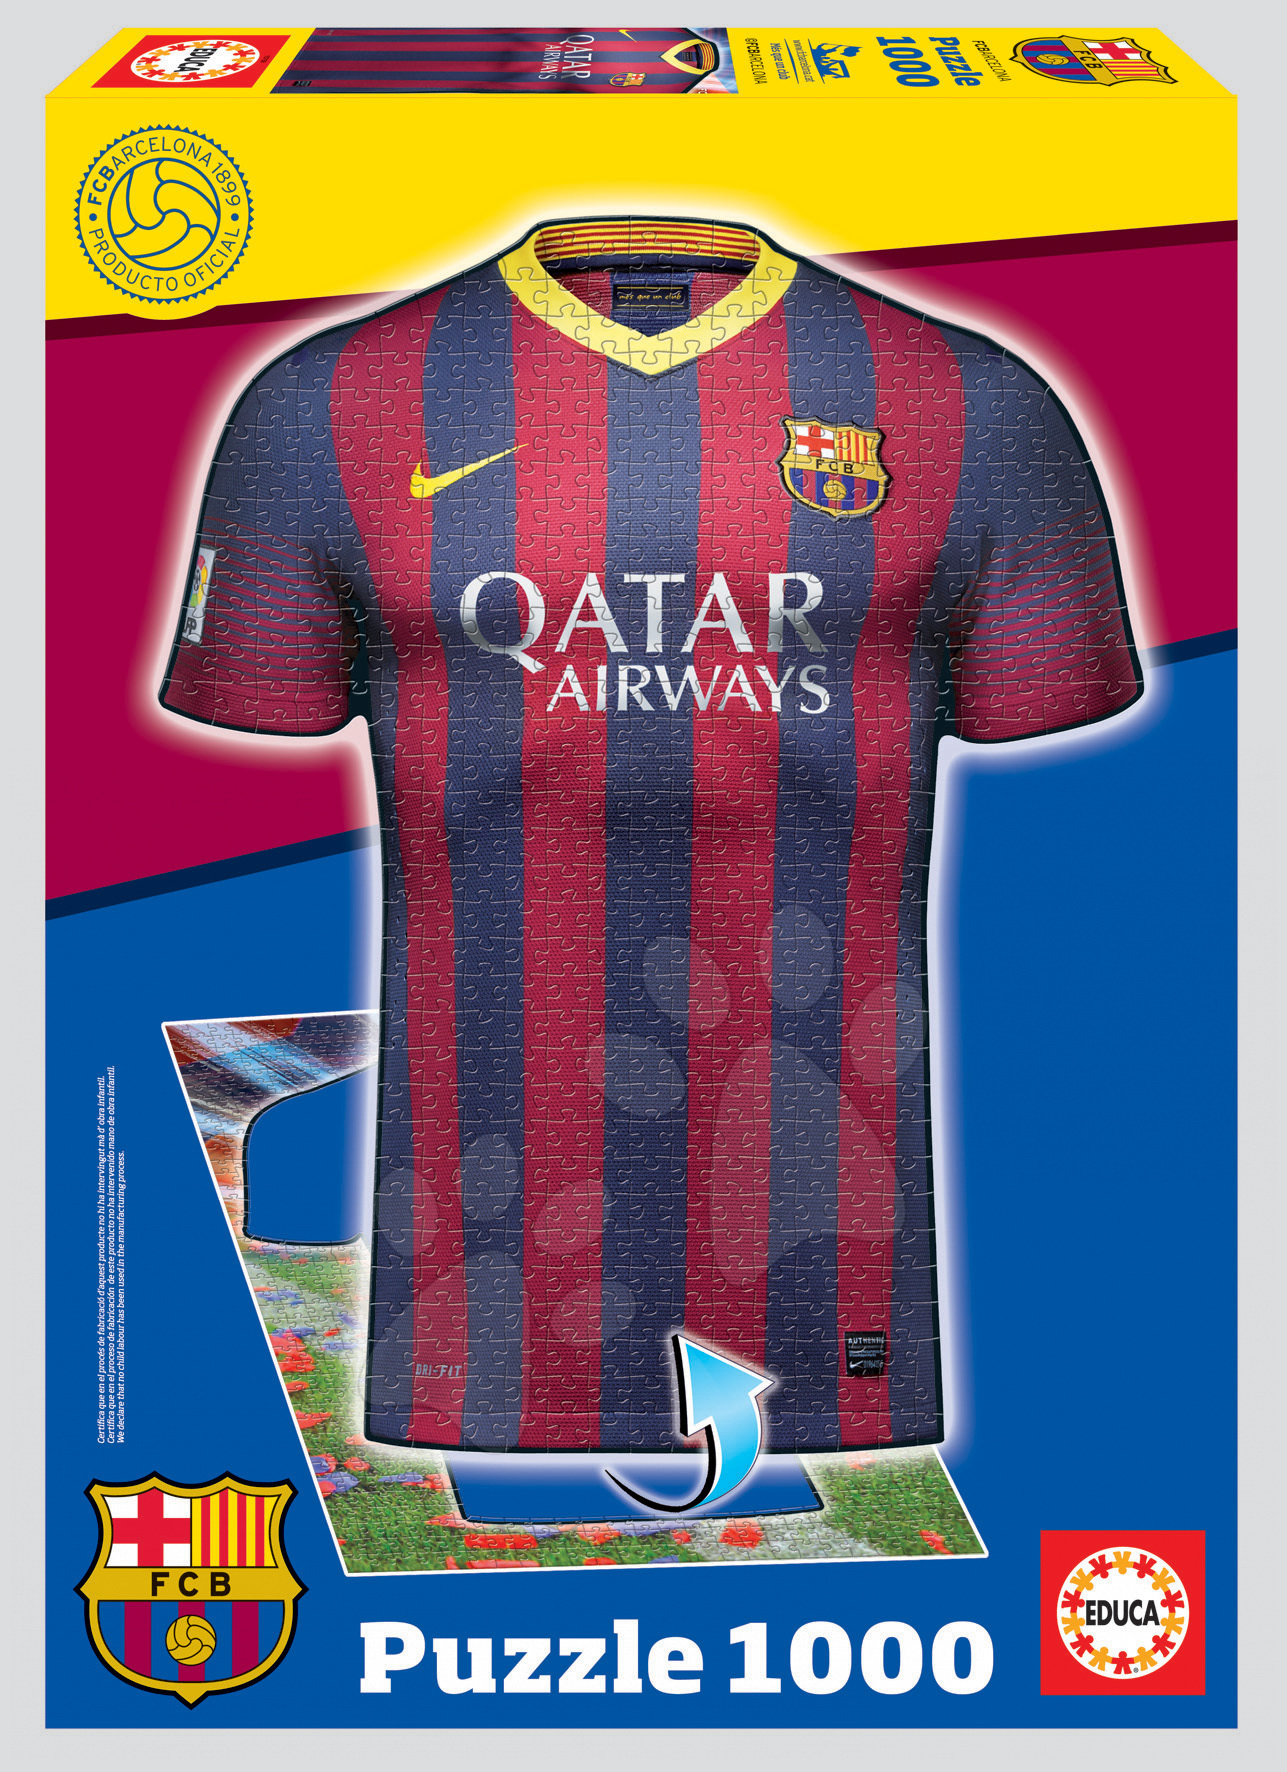 Puzzle 1000 dielne - Puzzle FC Barcelona Educa 1000 dielov od 12 rokov